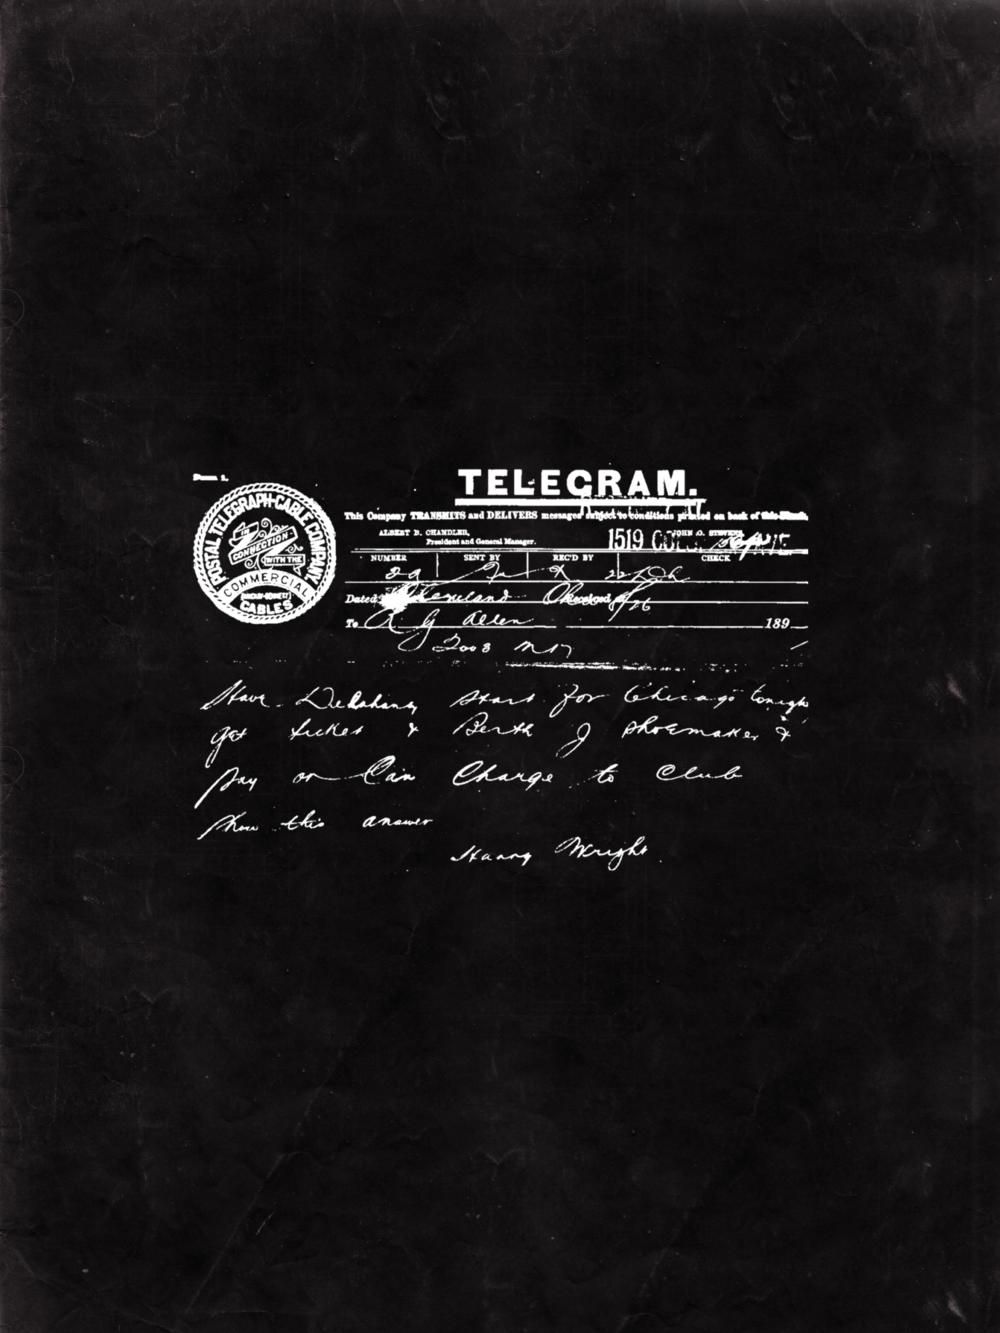 telegram PINK (0007).png